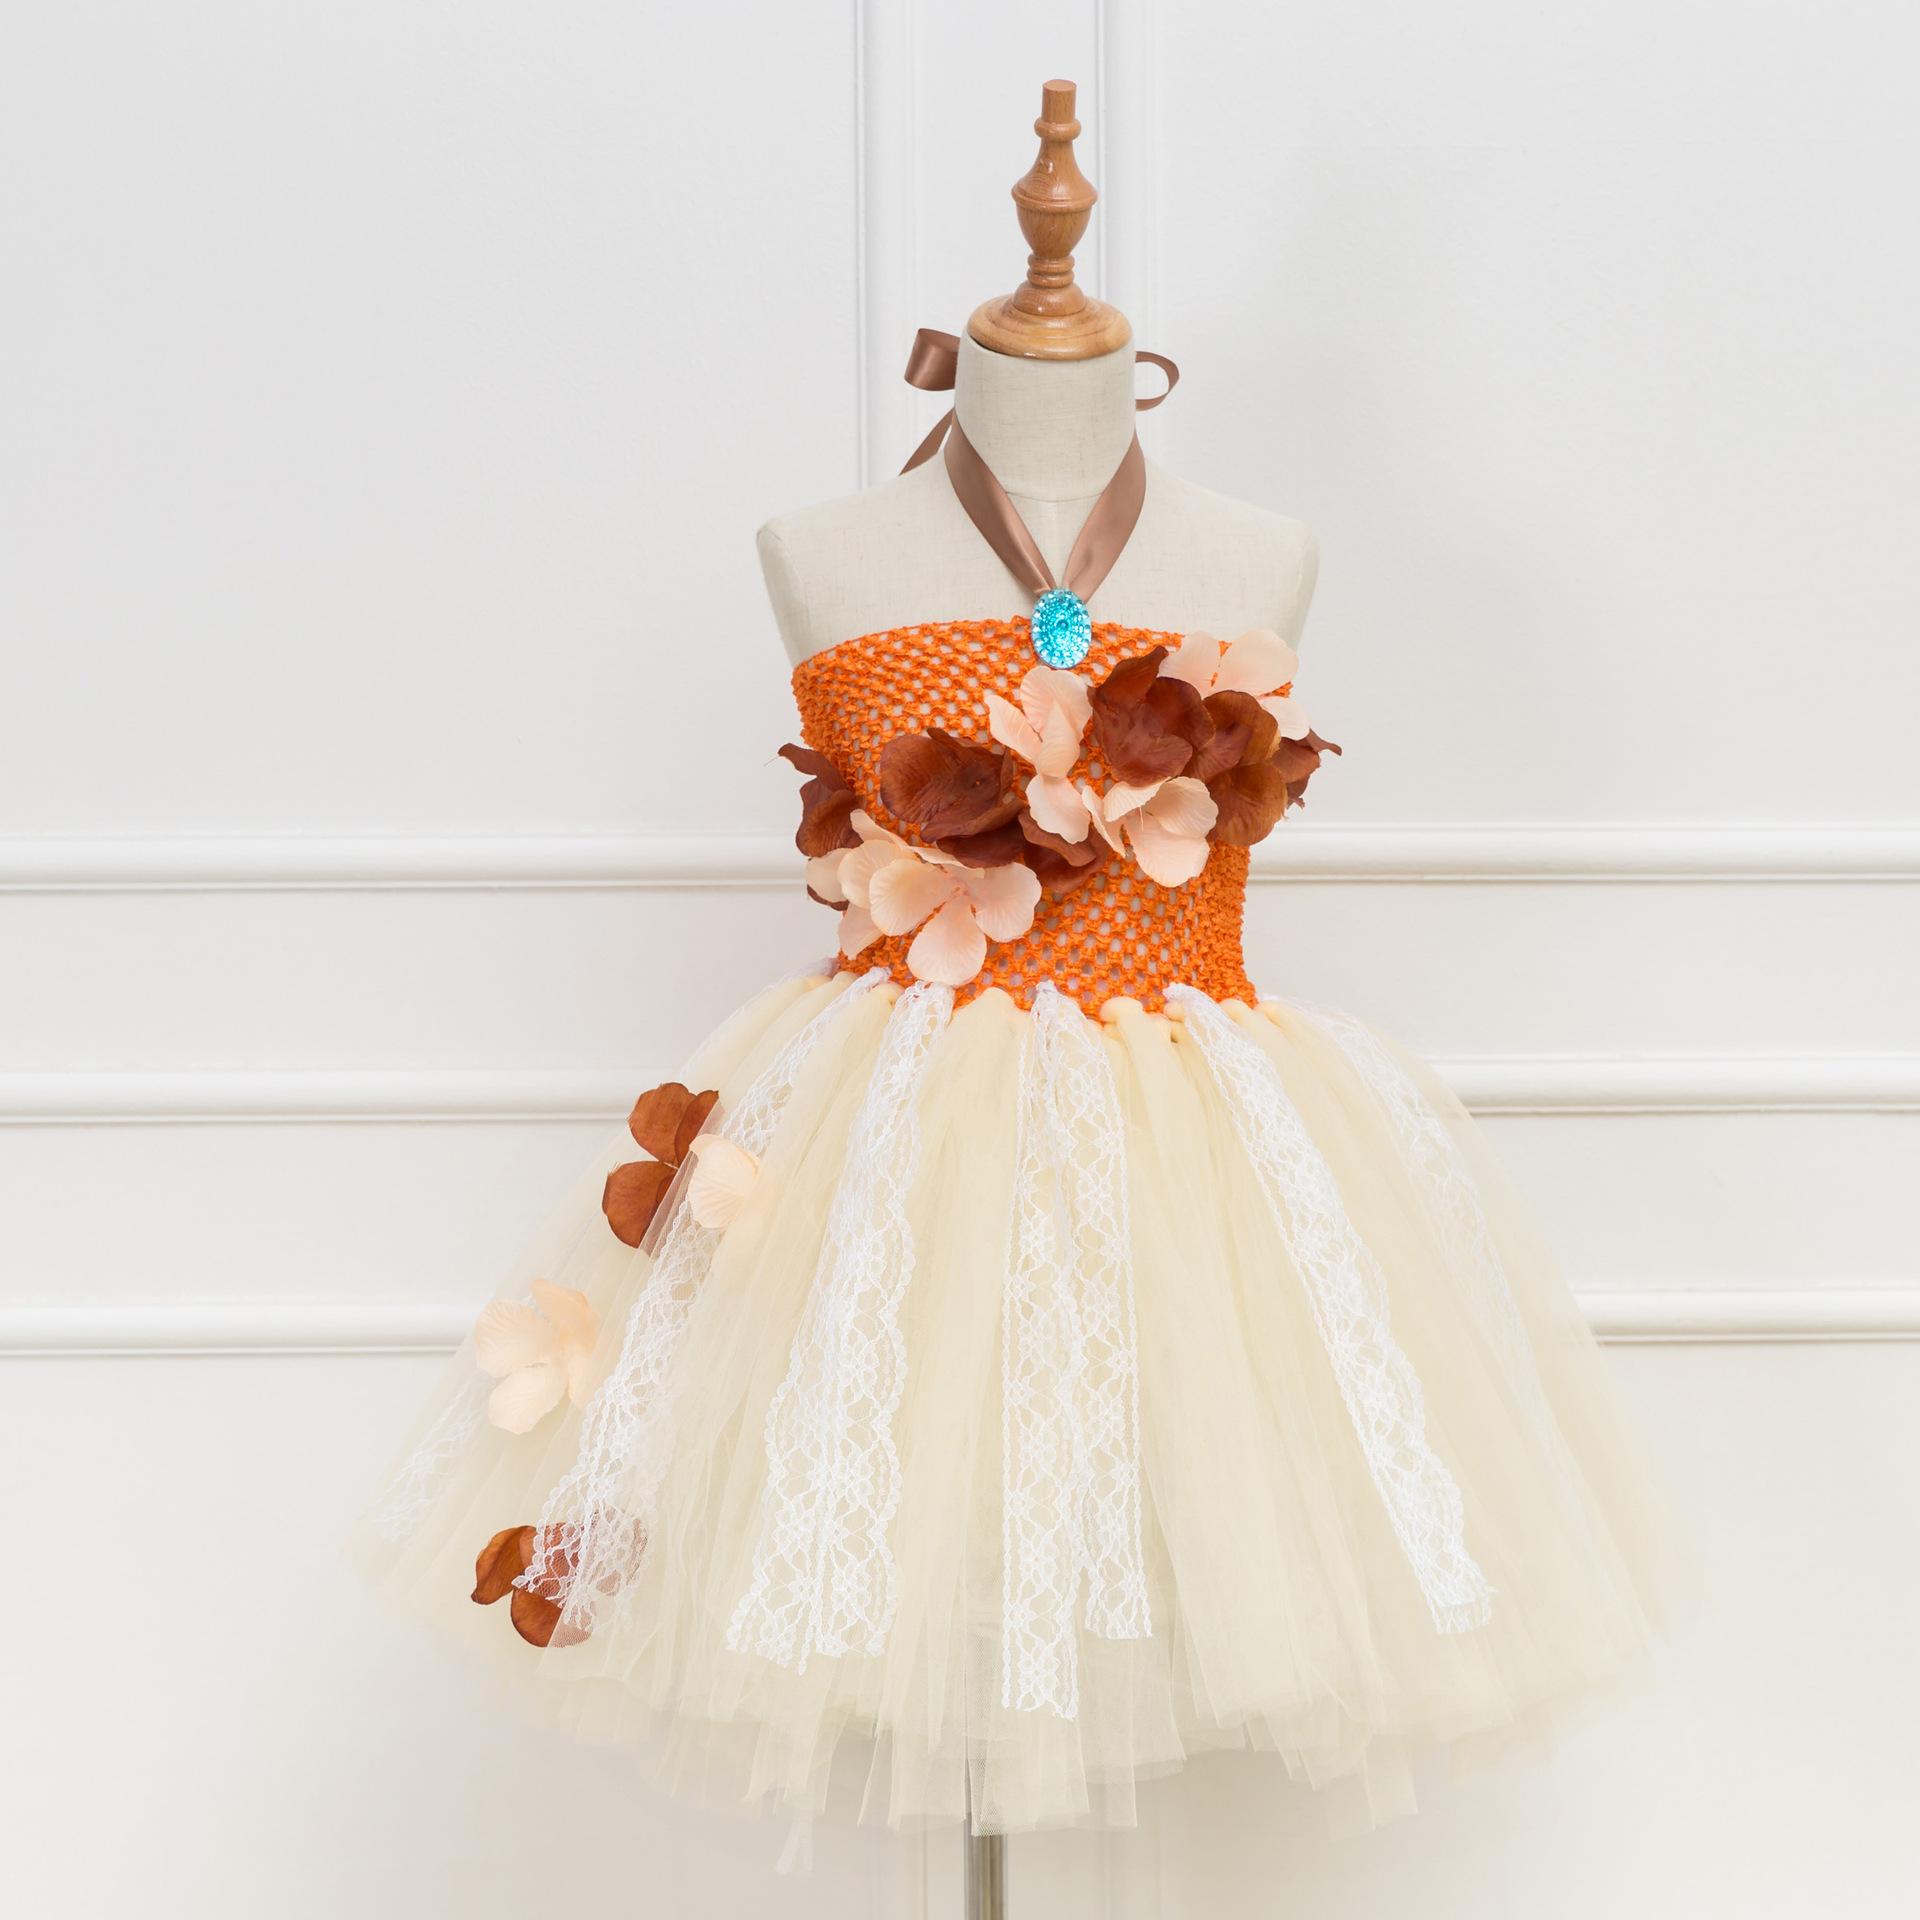 f07222bbf89ec Children Lace Flowers Girls Tutu Dress Fancy Girl Party Birthday Dress  Tulle Princess Dress Kids Halloween Christmas Cosplay Costume